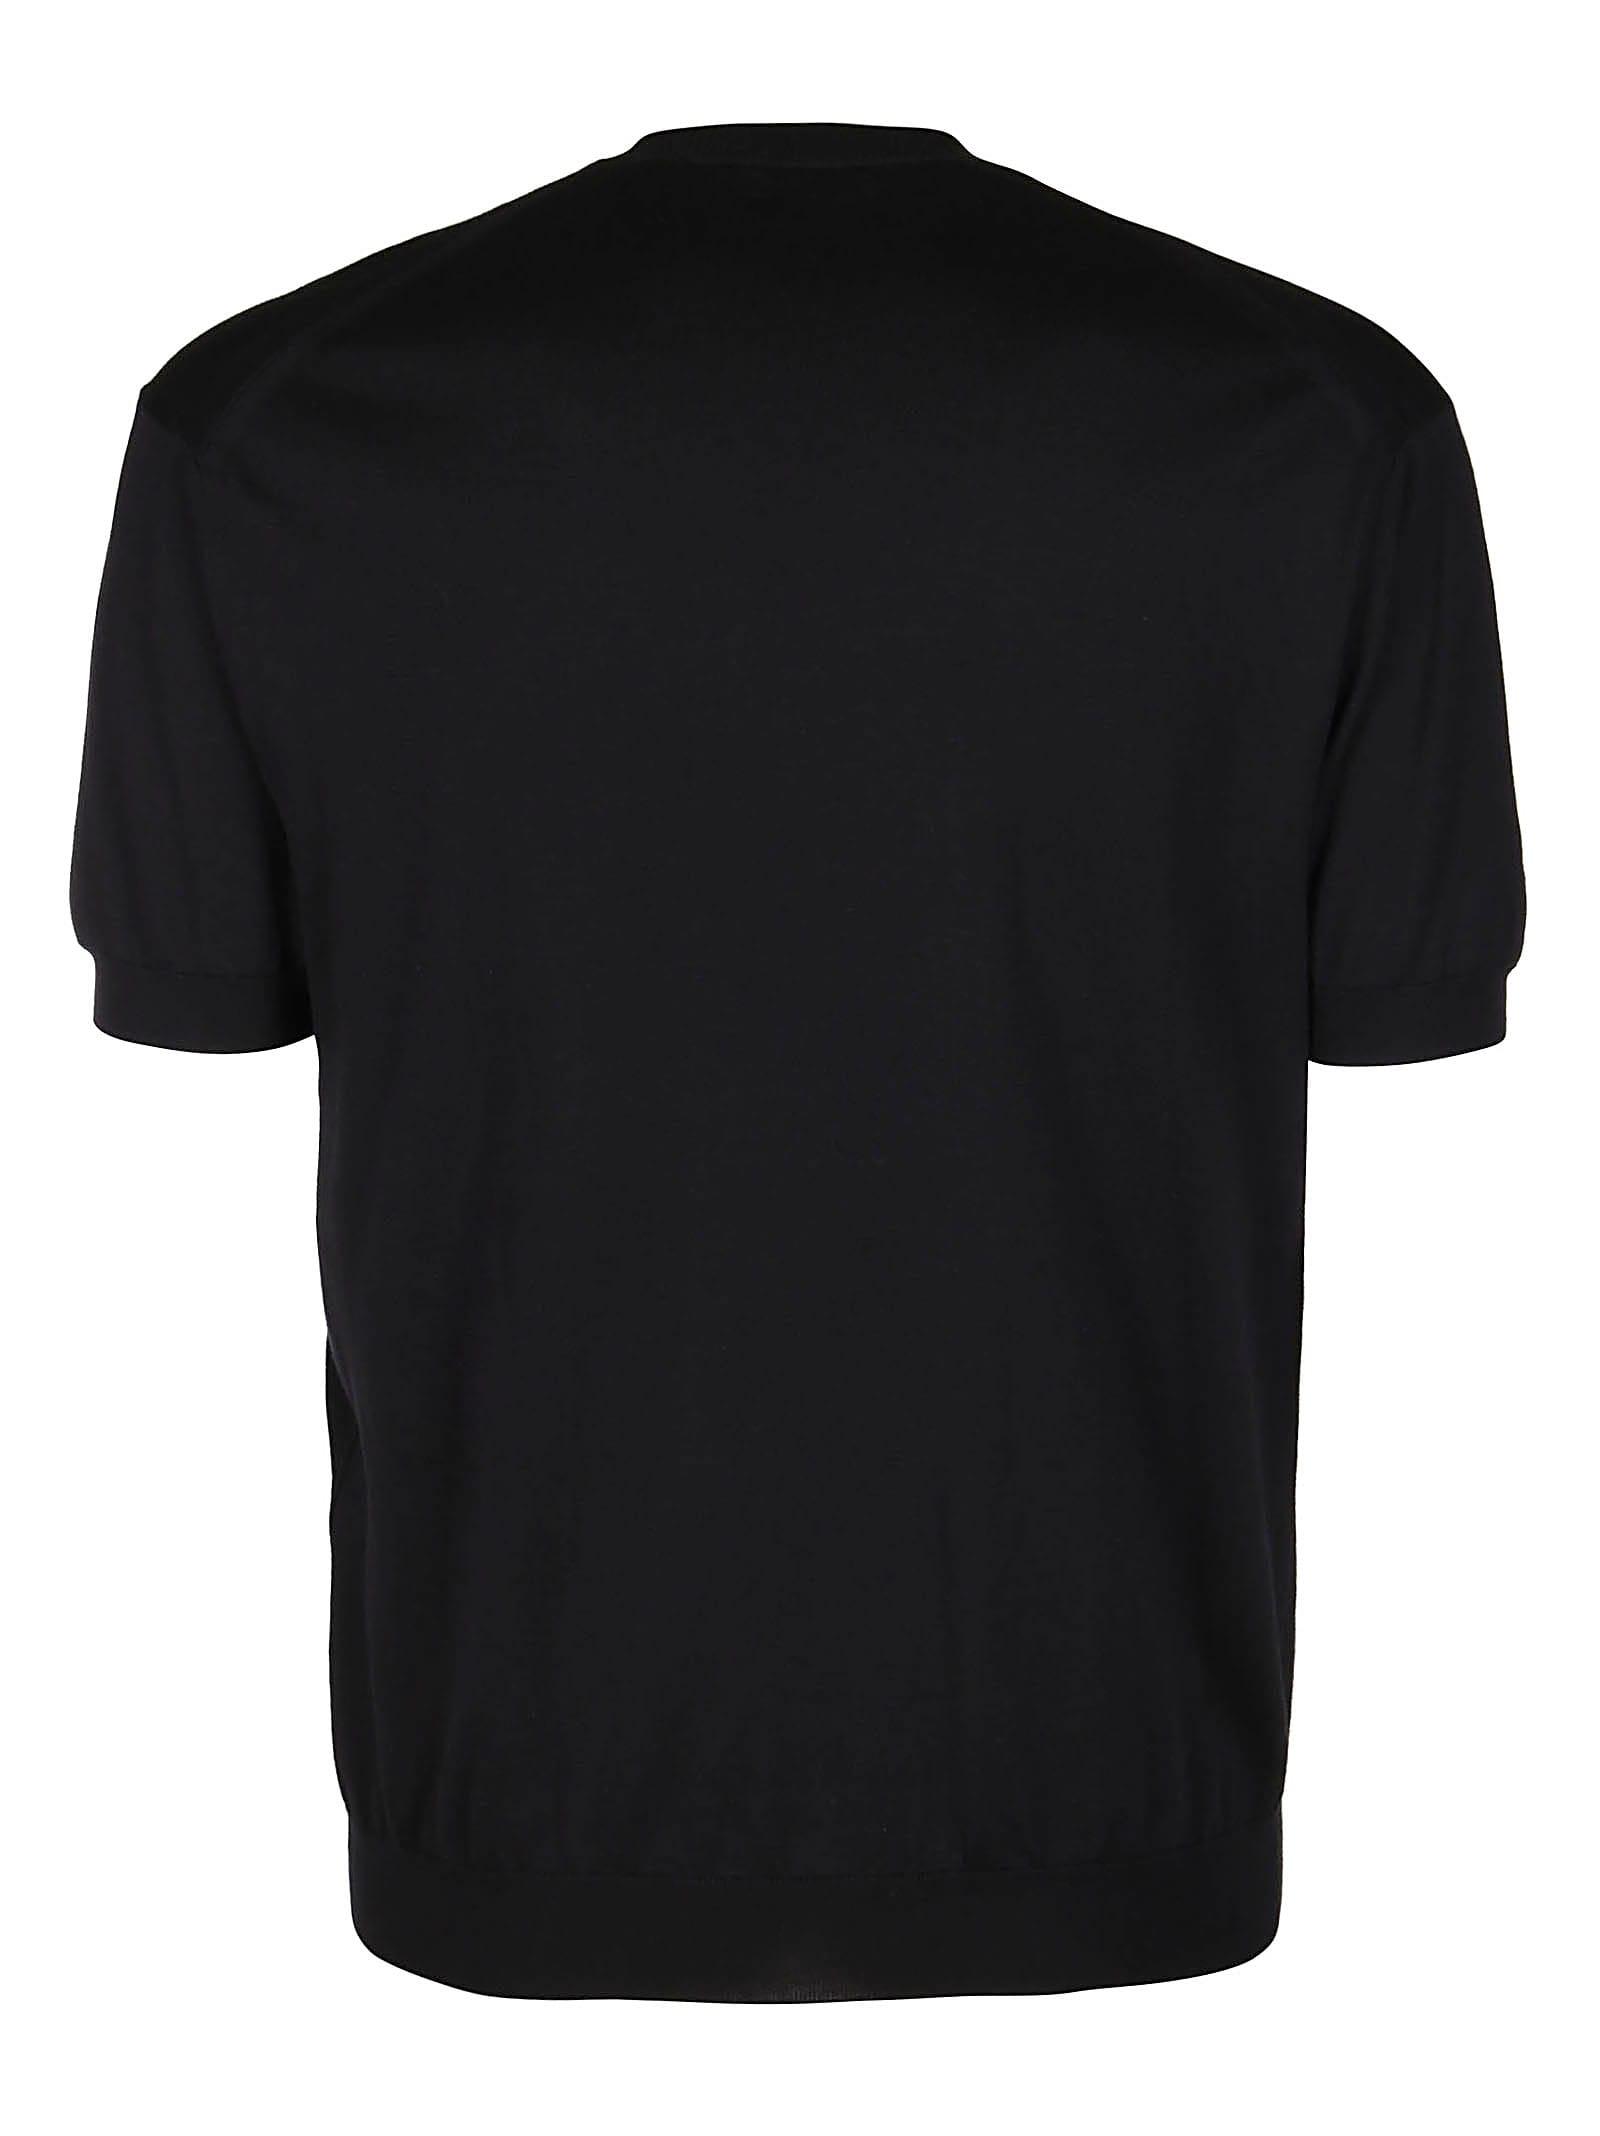 Tom Ford BLACK COTTON-SILK BLEND SWEATSHIRT